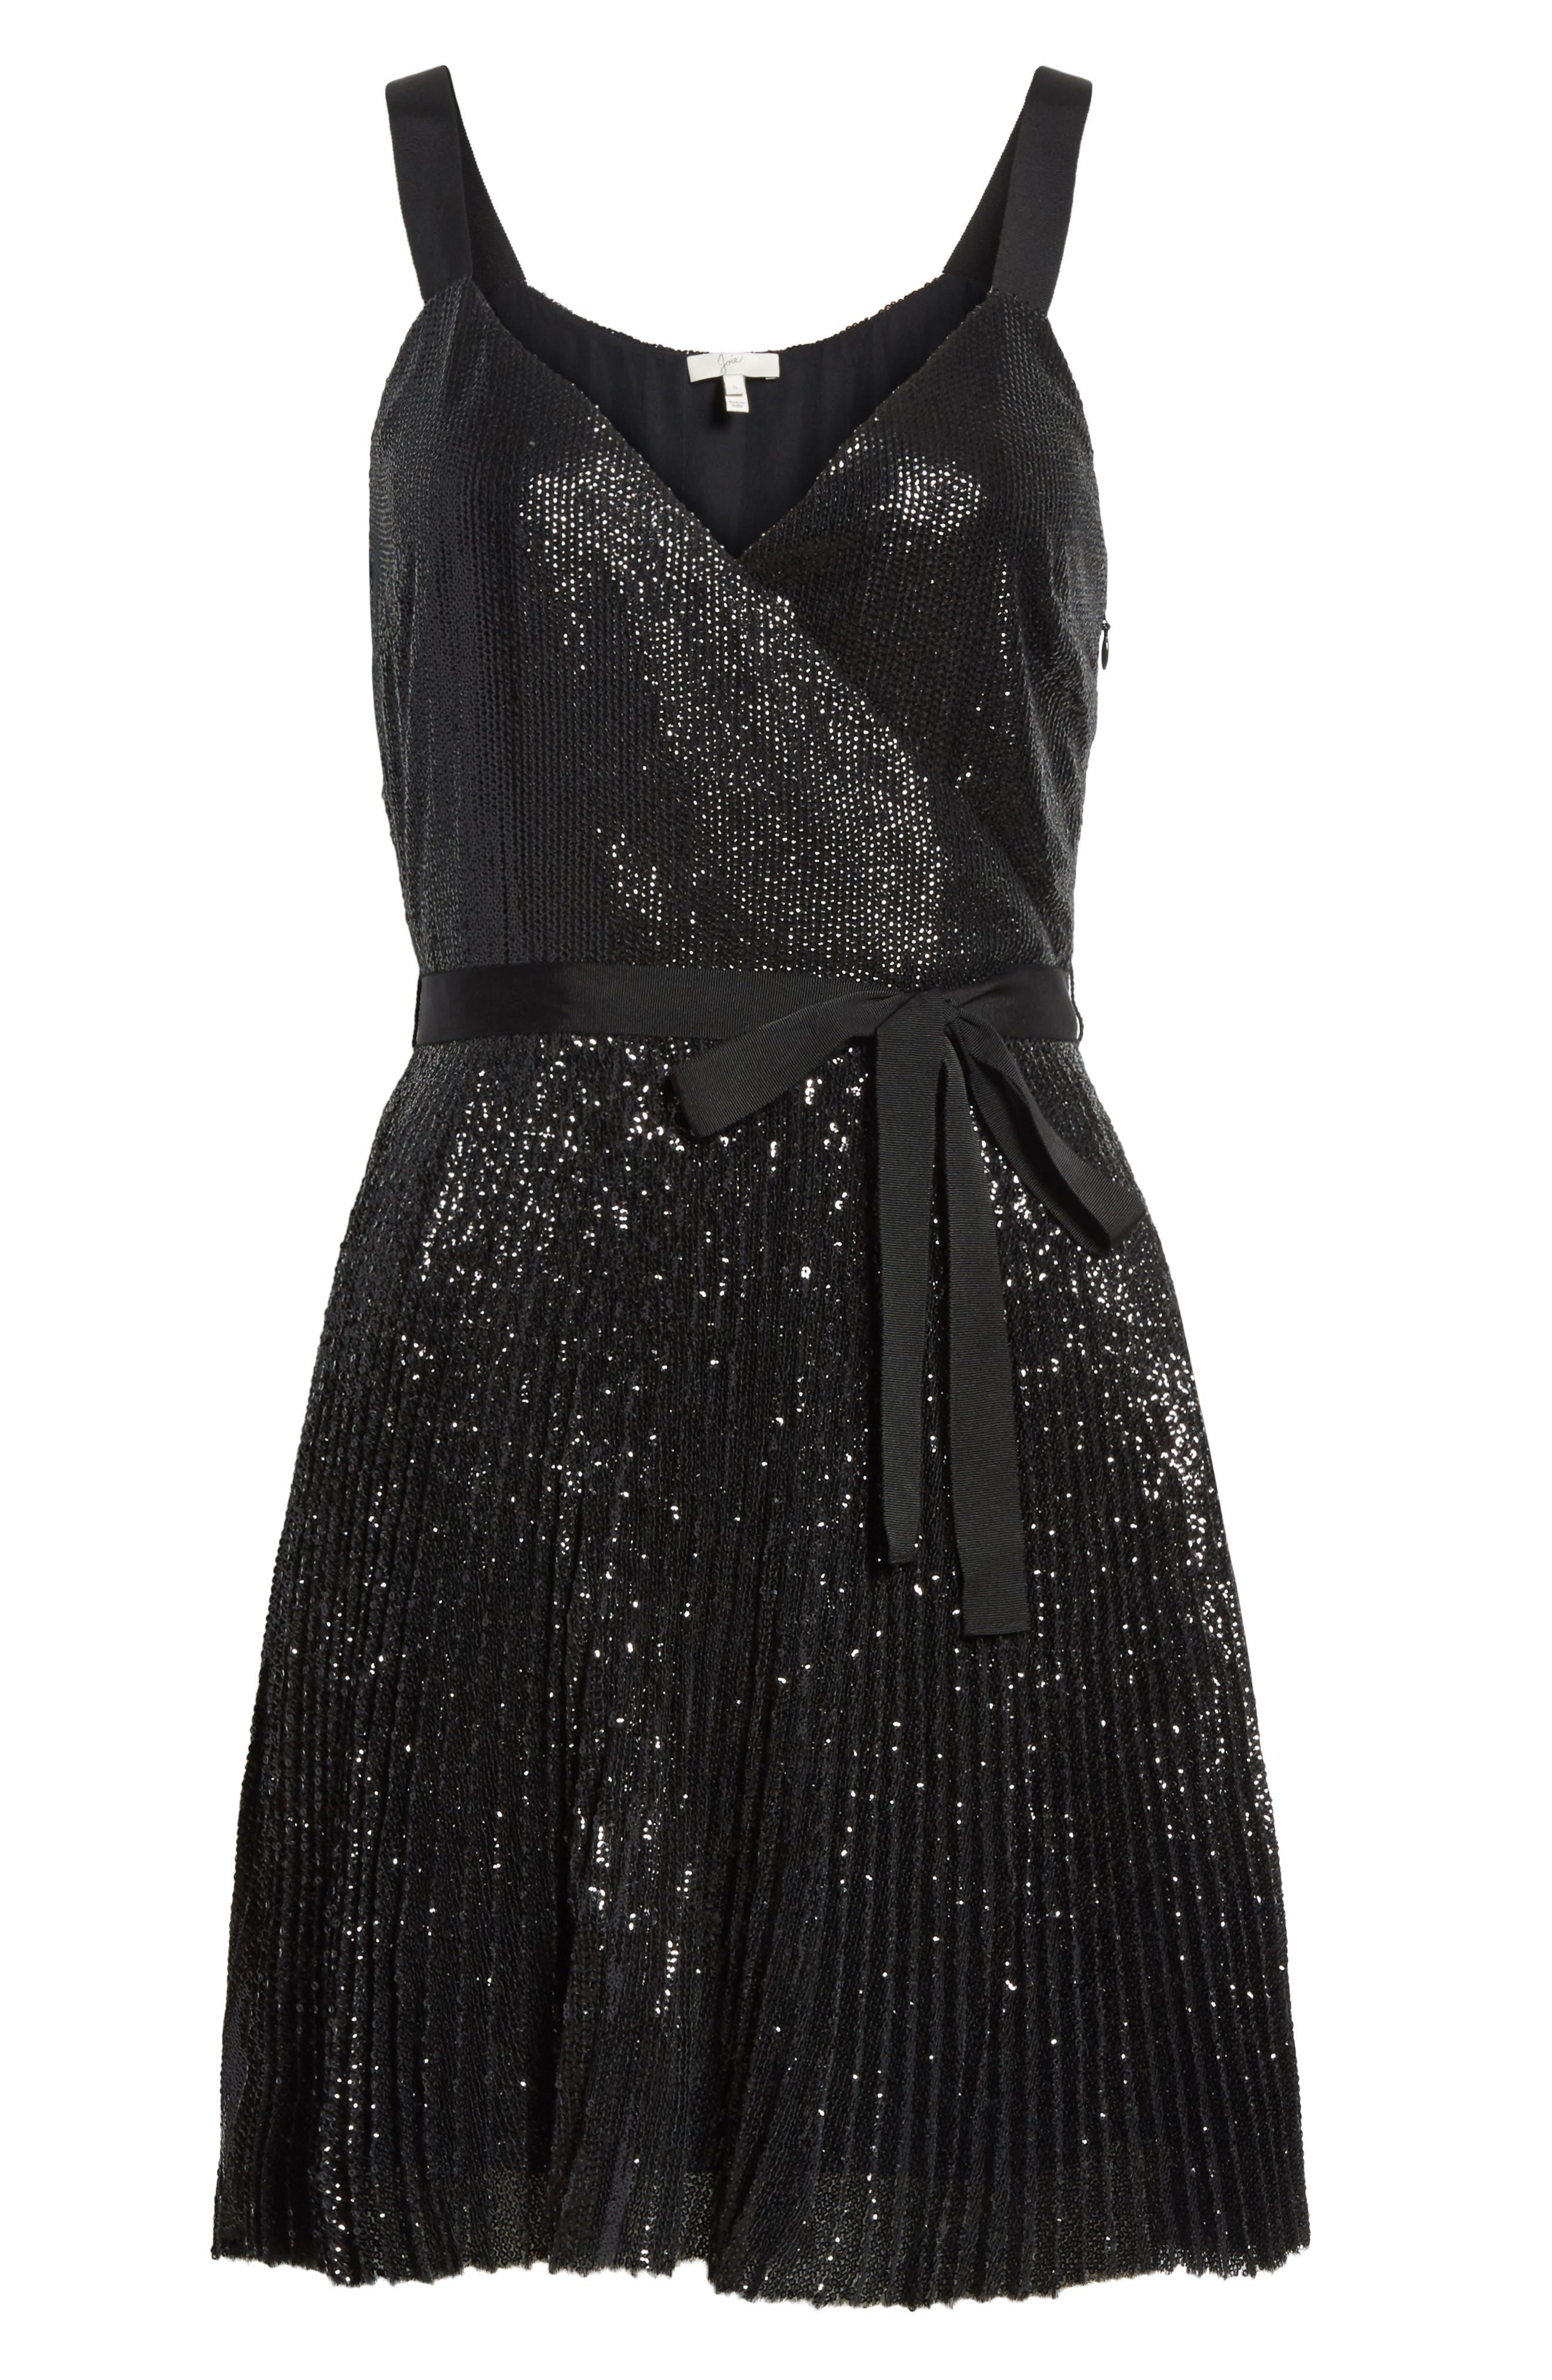 Itara Sequin Mesh Dress,                             Alternate thumbnail 6, color,                             Caviar